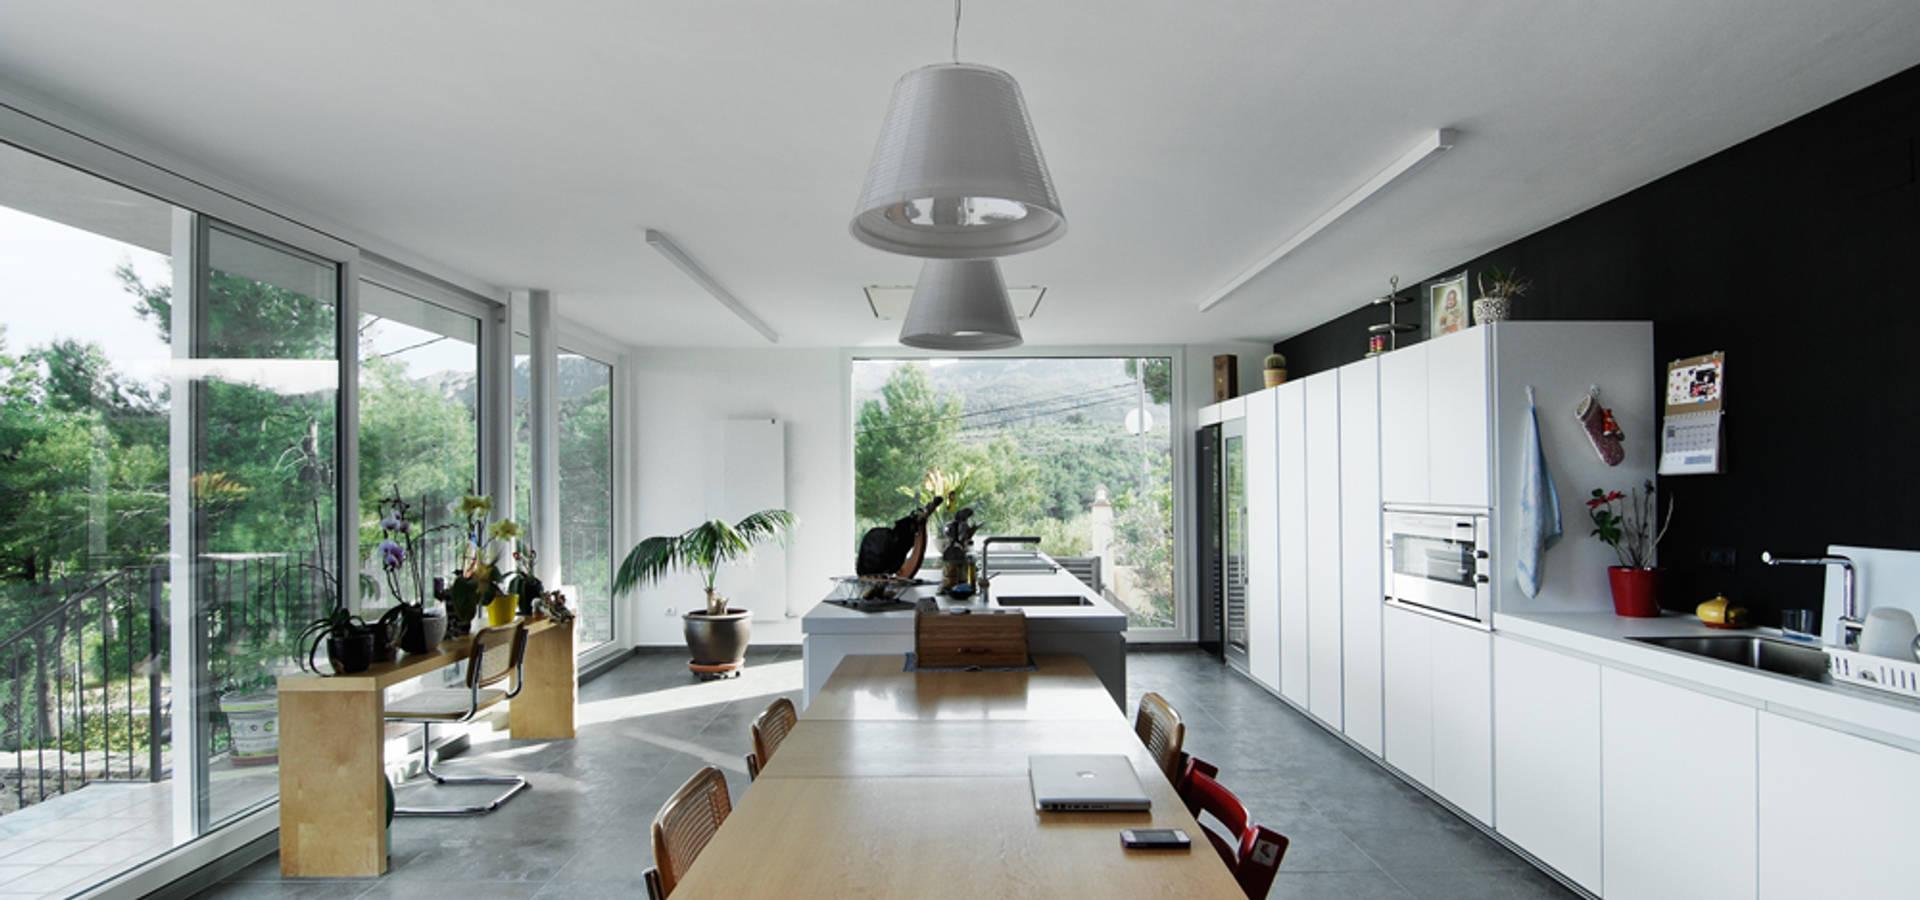 Jofre roca arquitectes arquitectos en barcelona homify - Despacho arquitectura barcelona ...